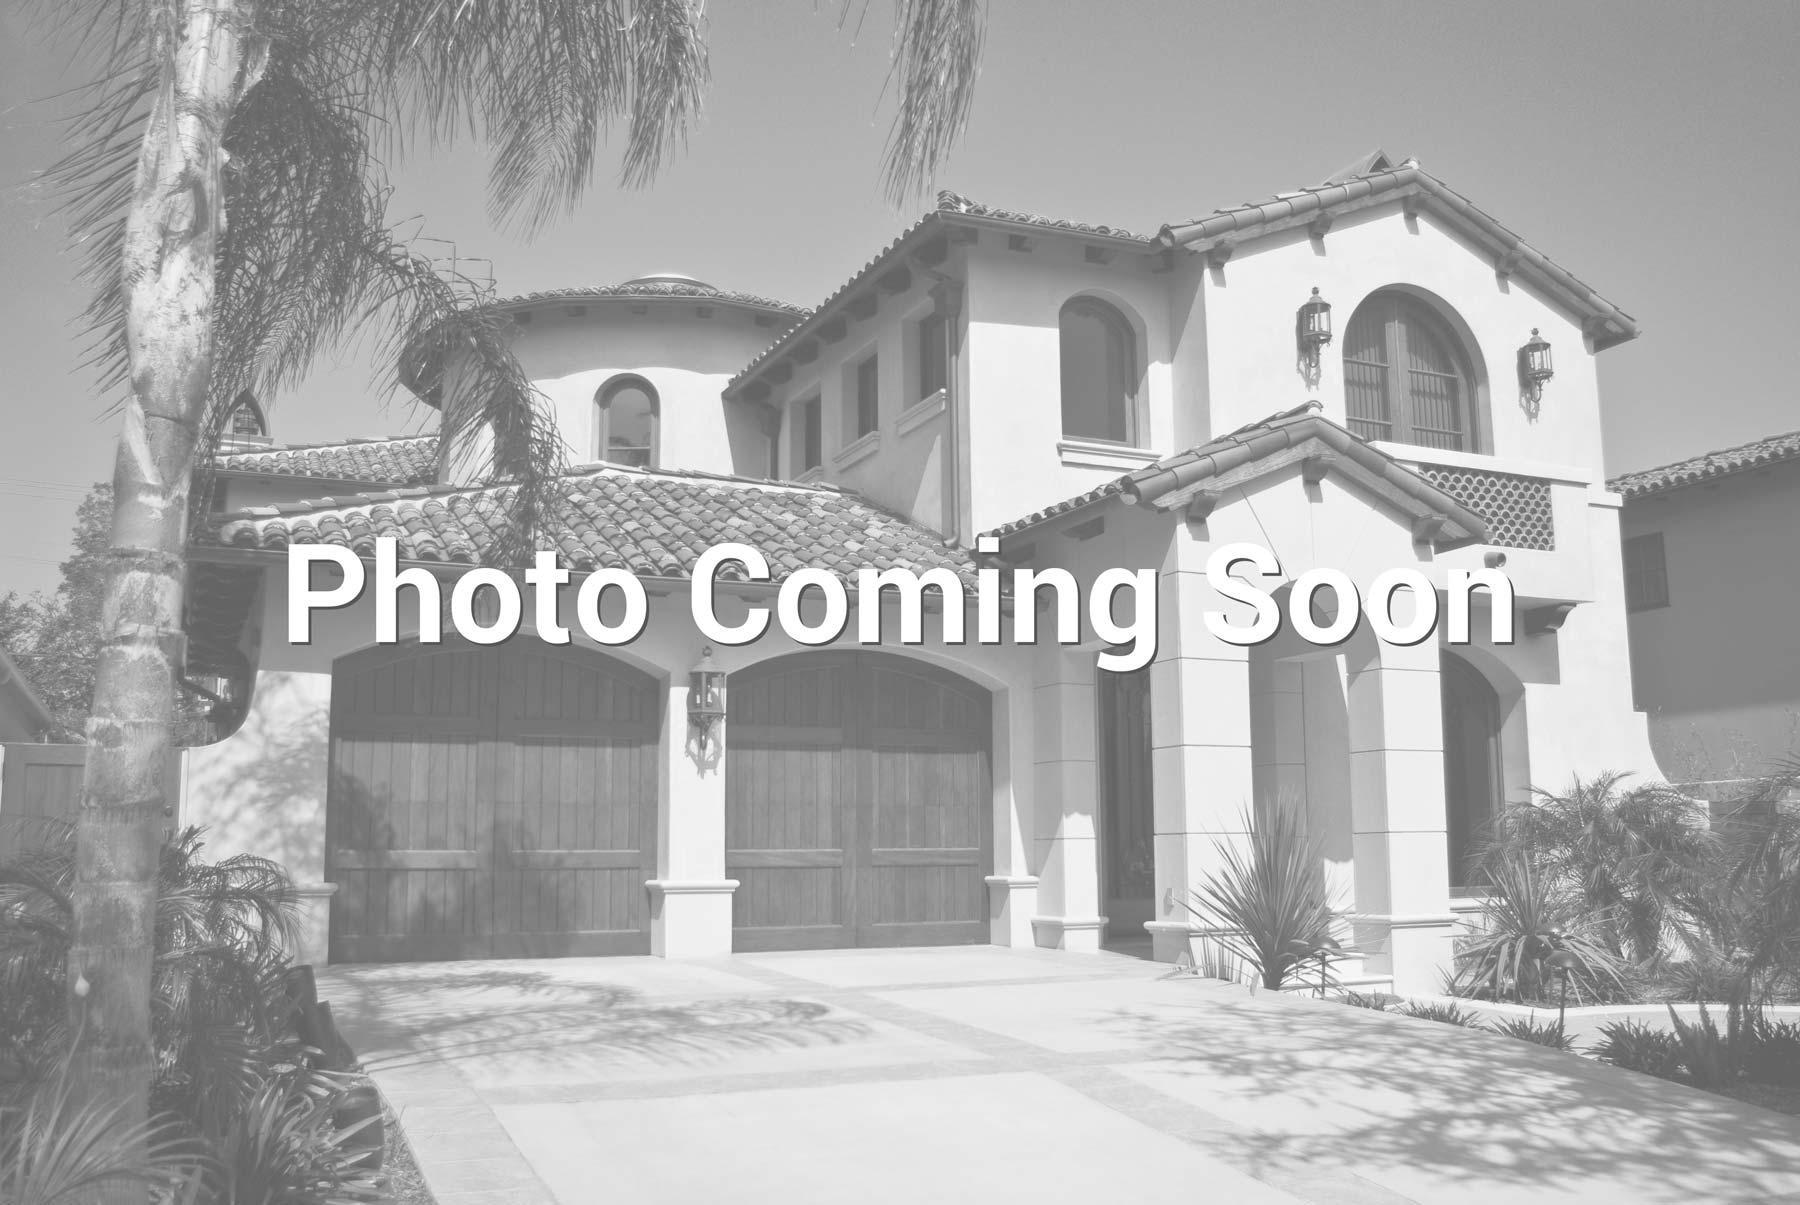 $1,300,000 - 4Br/4Ba - Home for Sale in Fountain Hills Arizona Final Plat No 411 Blocks 3, Fountain Hills